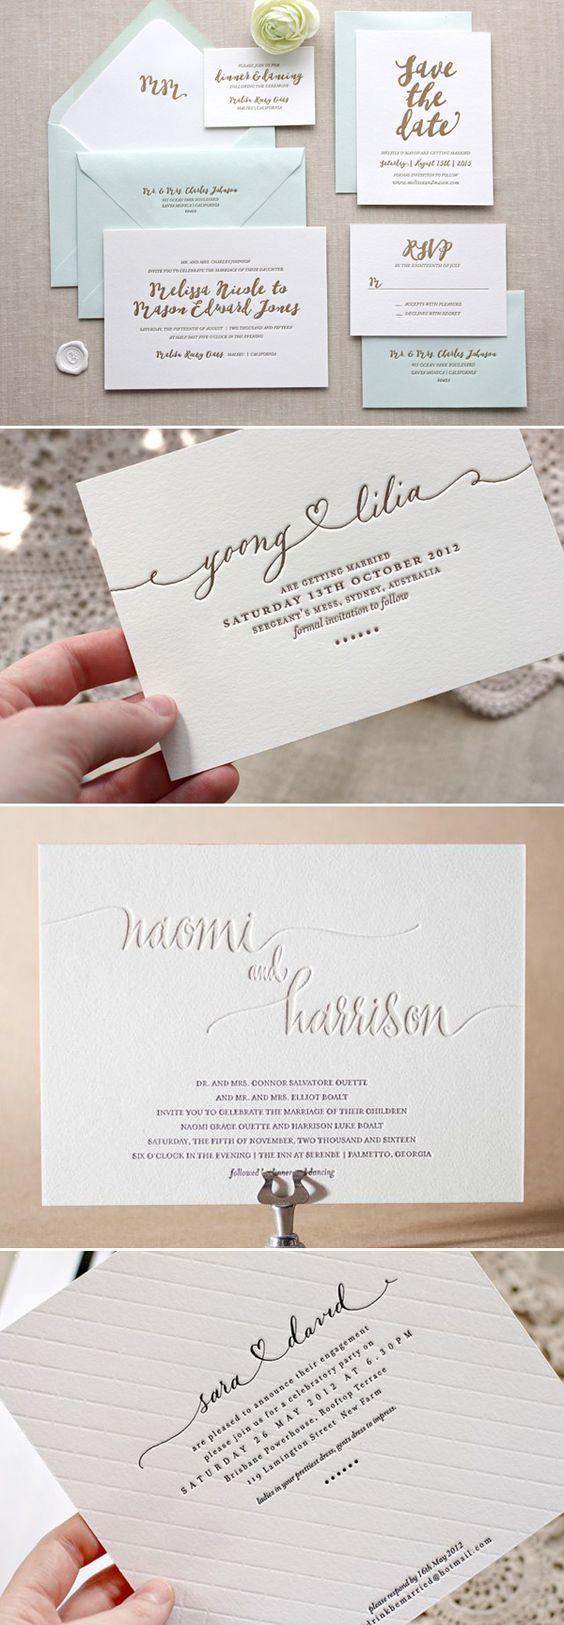 Letterpress wedding invitations 50 best Wedding invitations